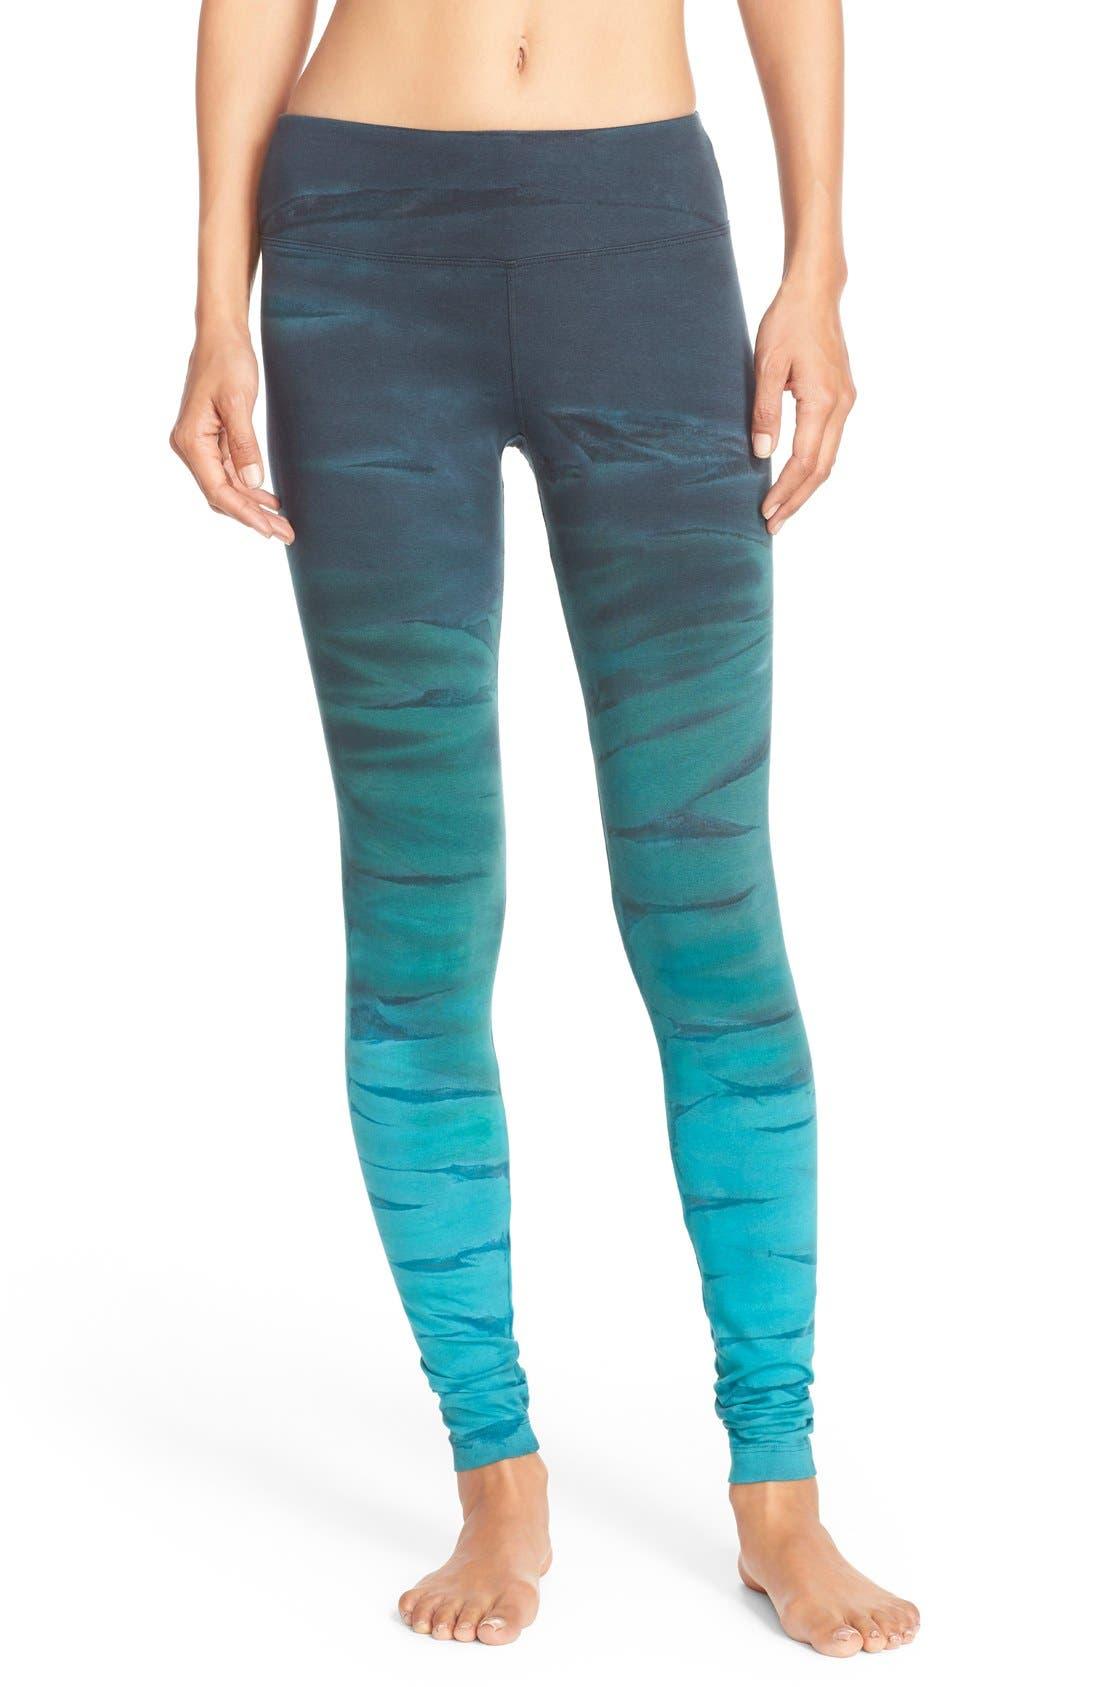 Alternate Image 1 Selected - Hard Tail Tie Dye Leggings